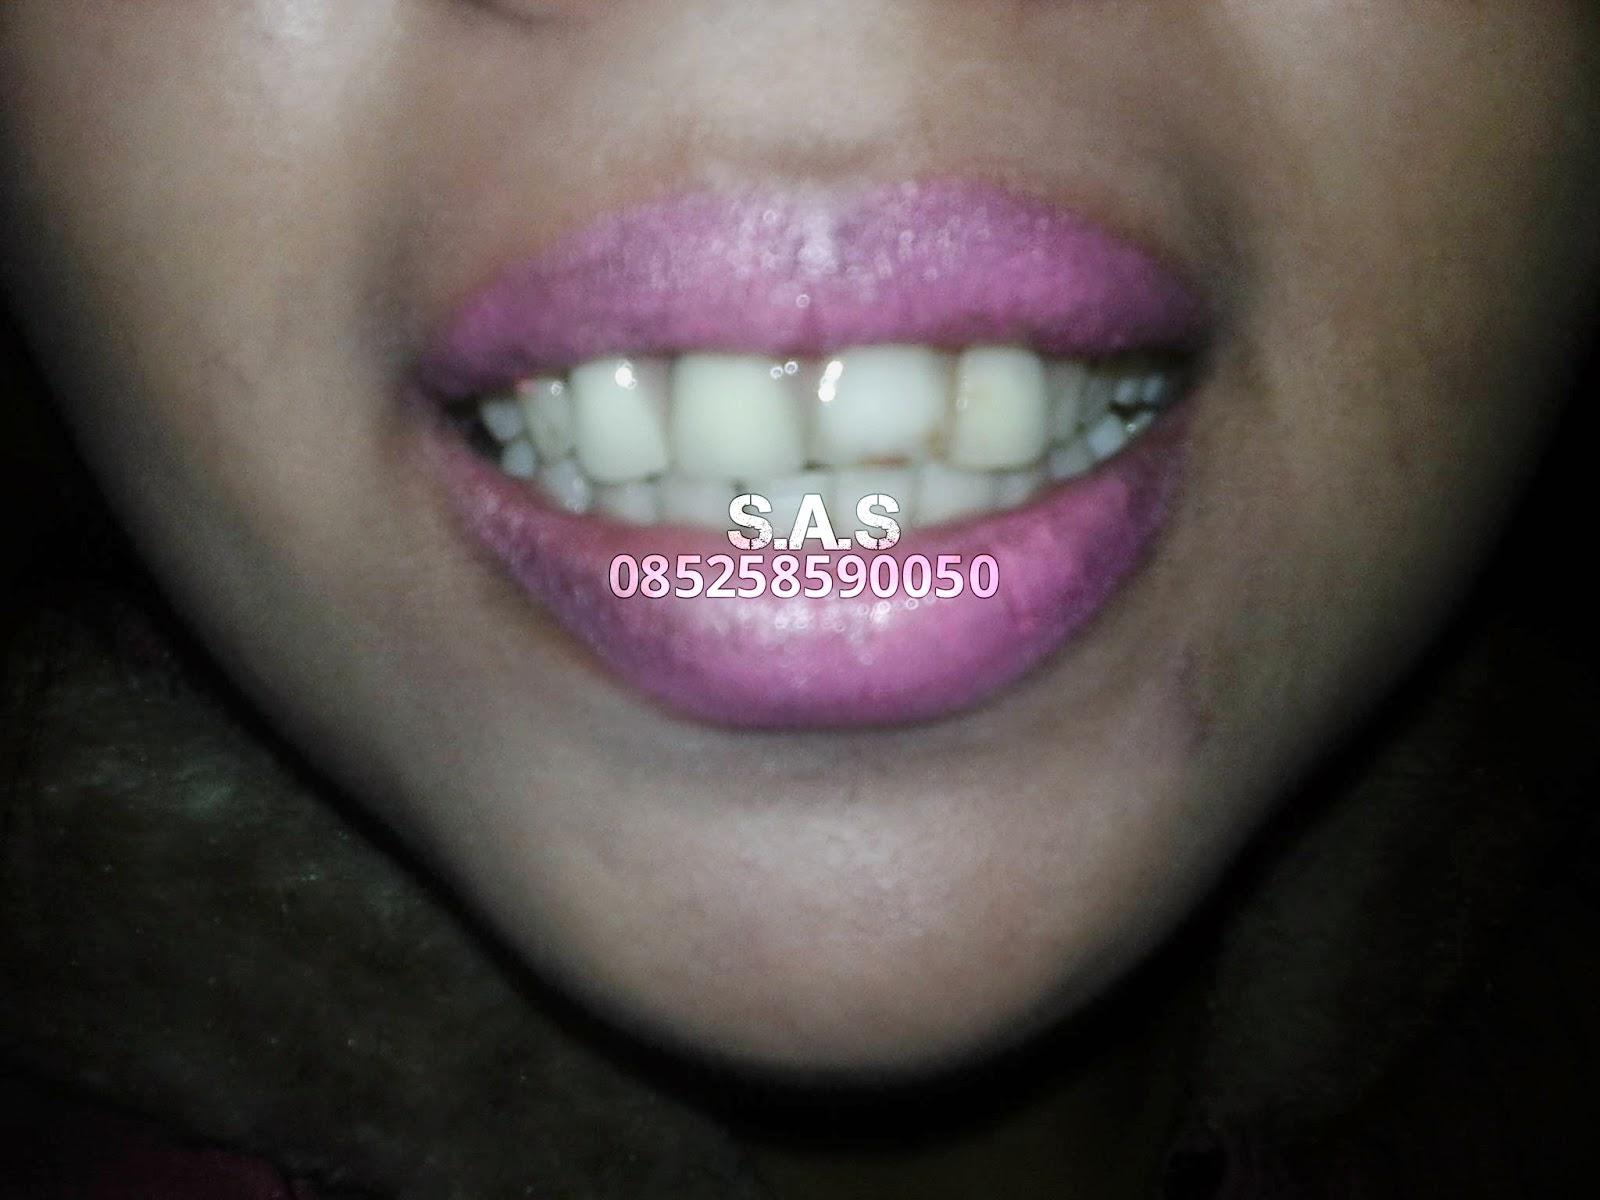 Gambar Ahli Gigi Kota Pati Jateng Jember Jatim Foto Tiruan Estetika ... 69a354efa7